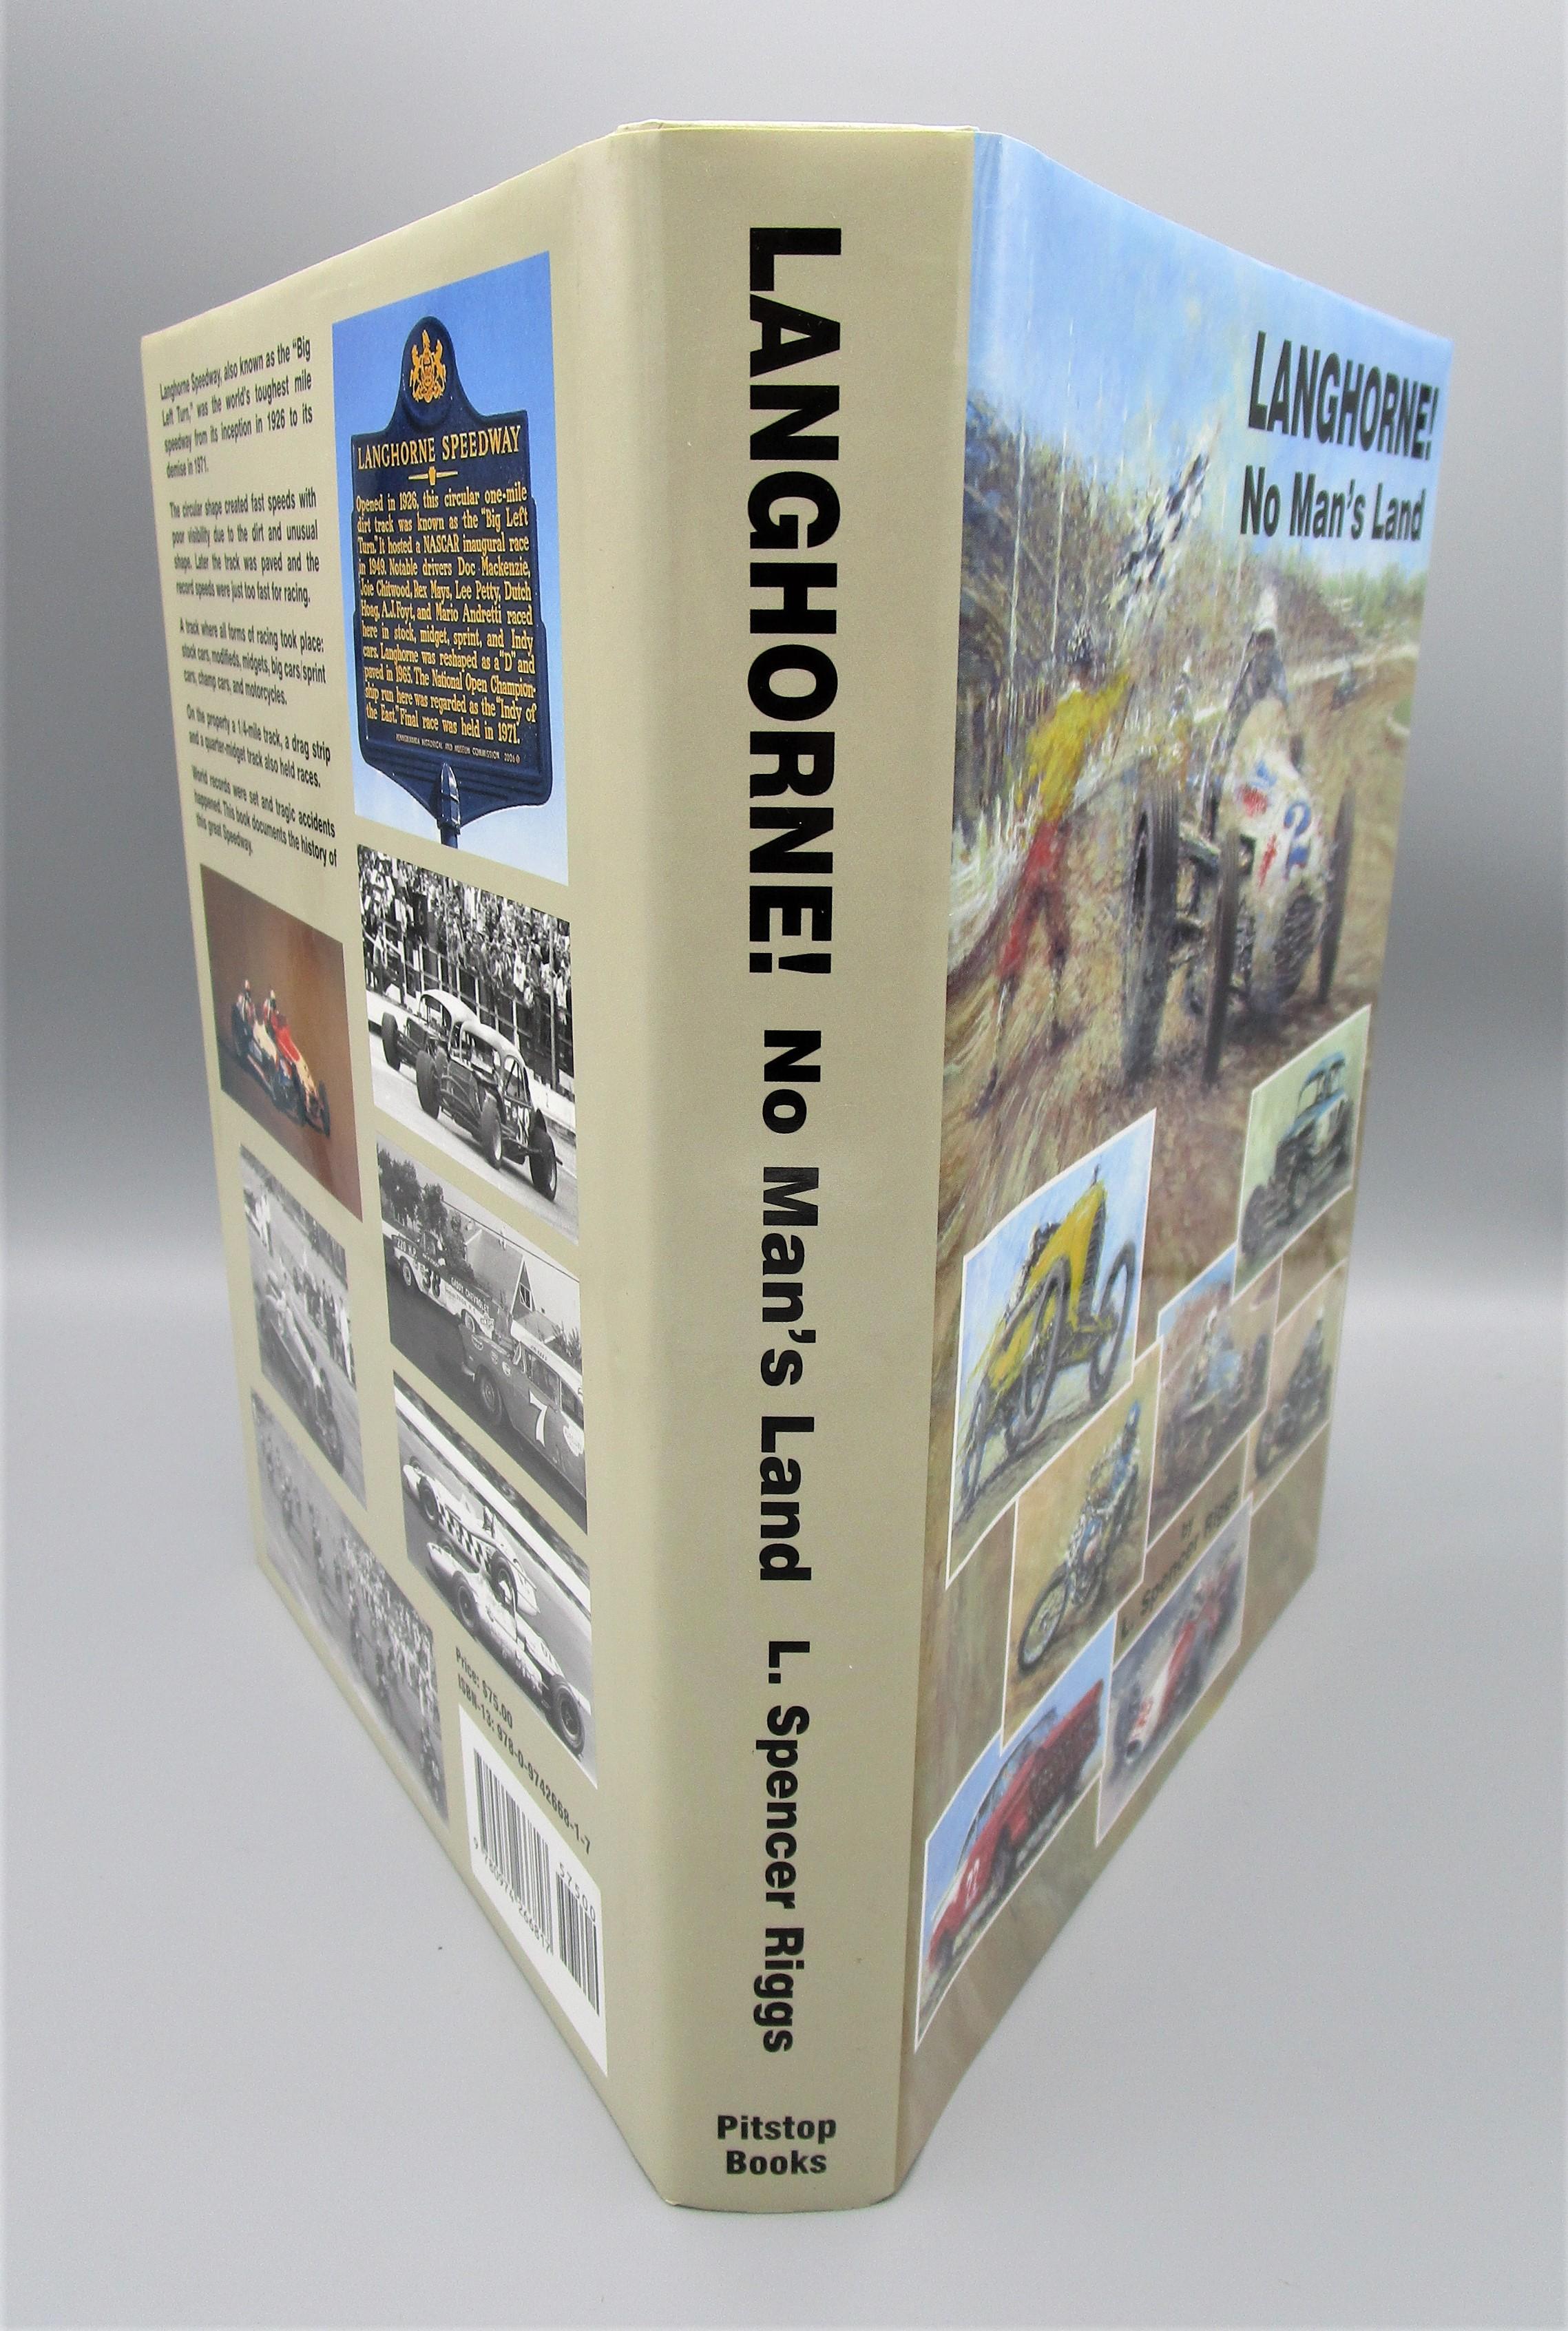 LANGHORNE! NO MAN'S LAND, by L. Spencer Riggs - 2008